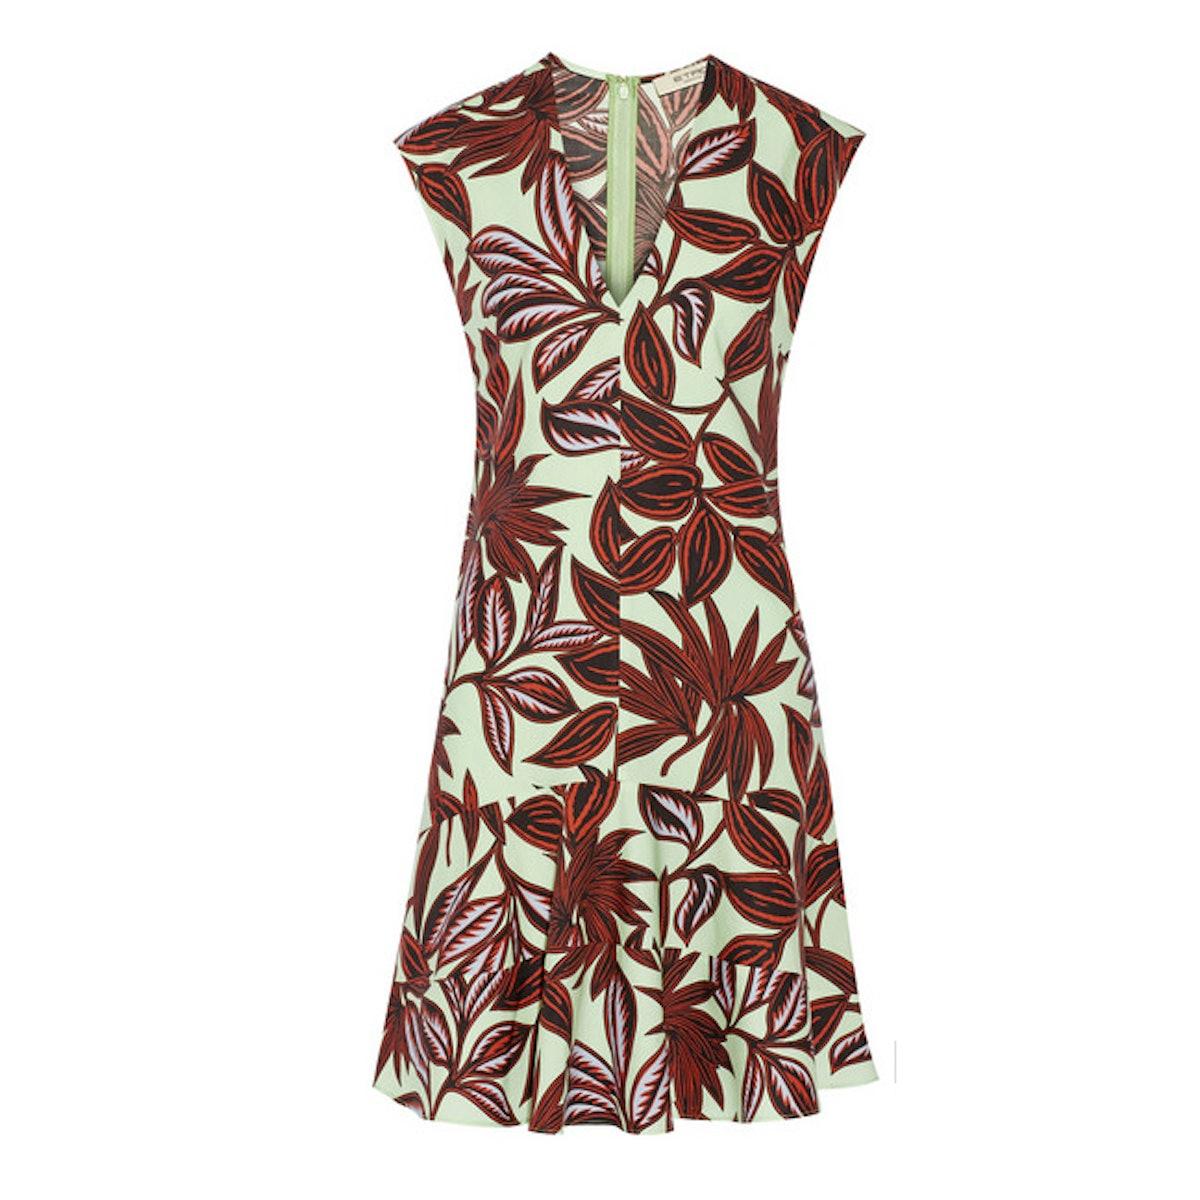 ETRO-DRESS-Bold-Florals